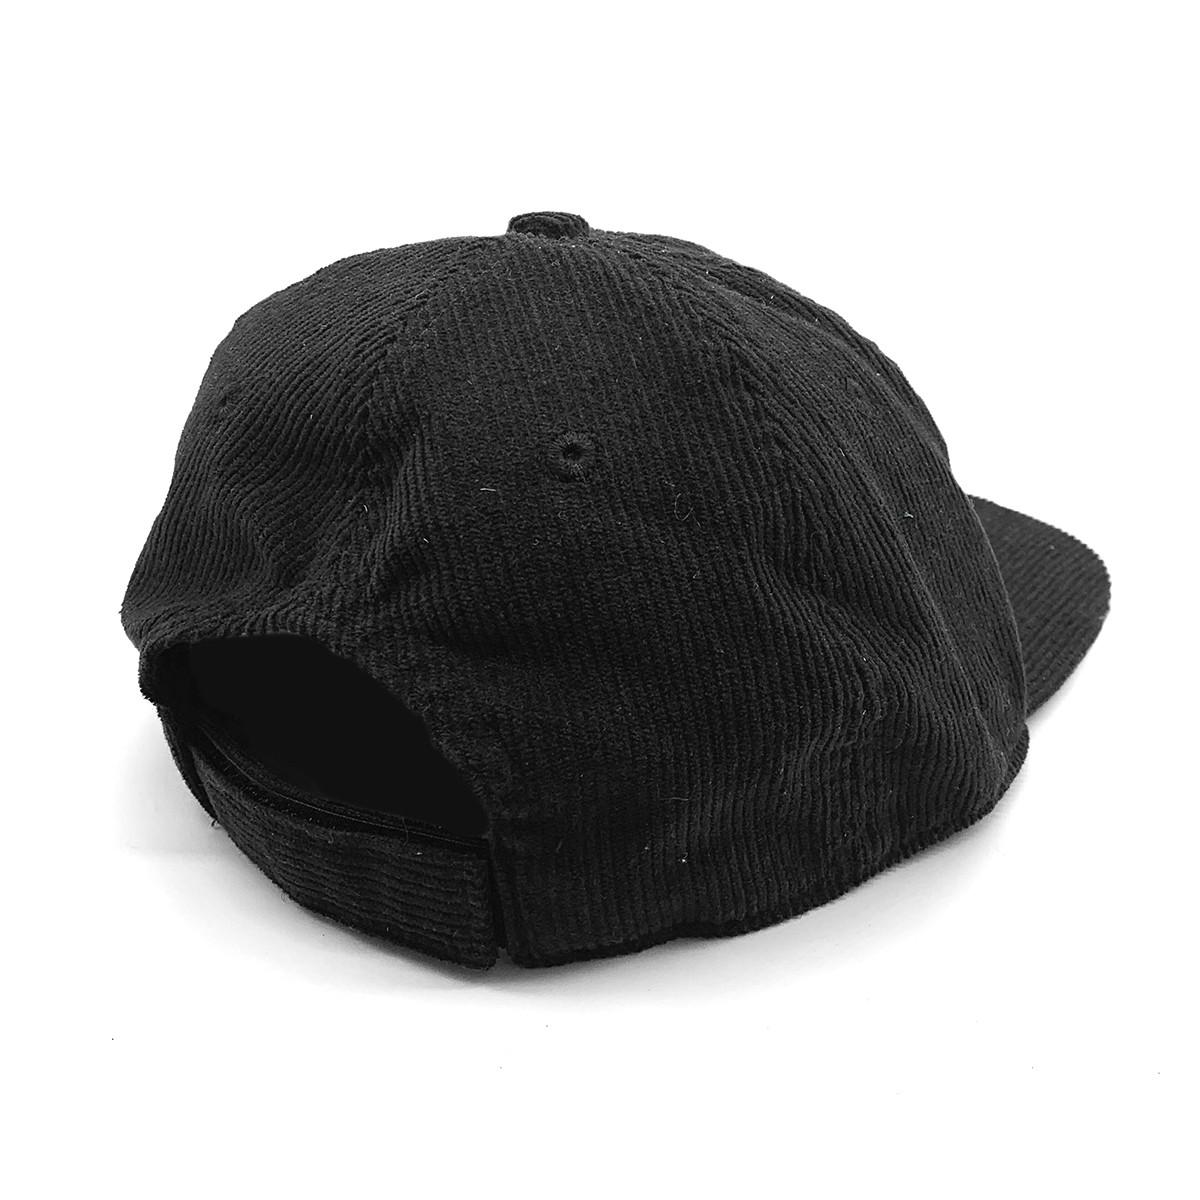 WHITE OX VINTAGE CORD HAT IN BLACK